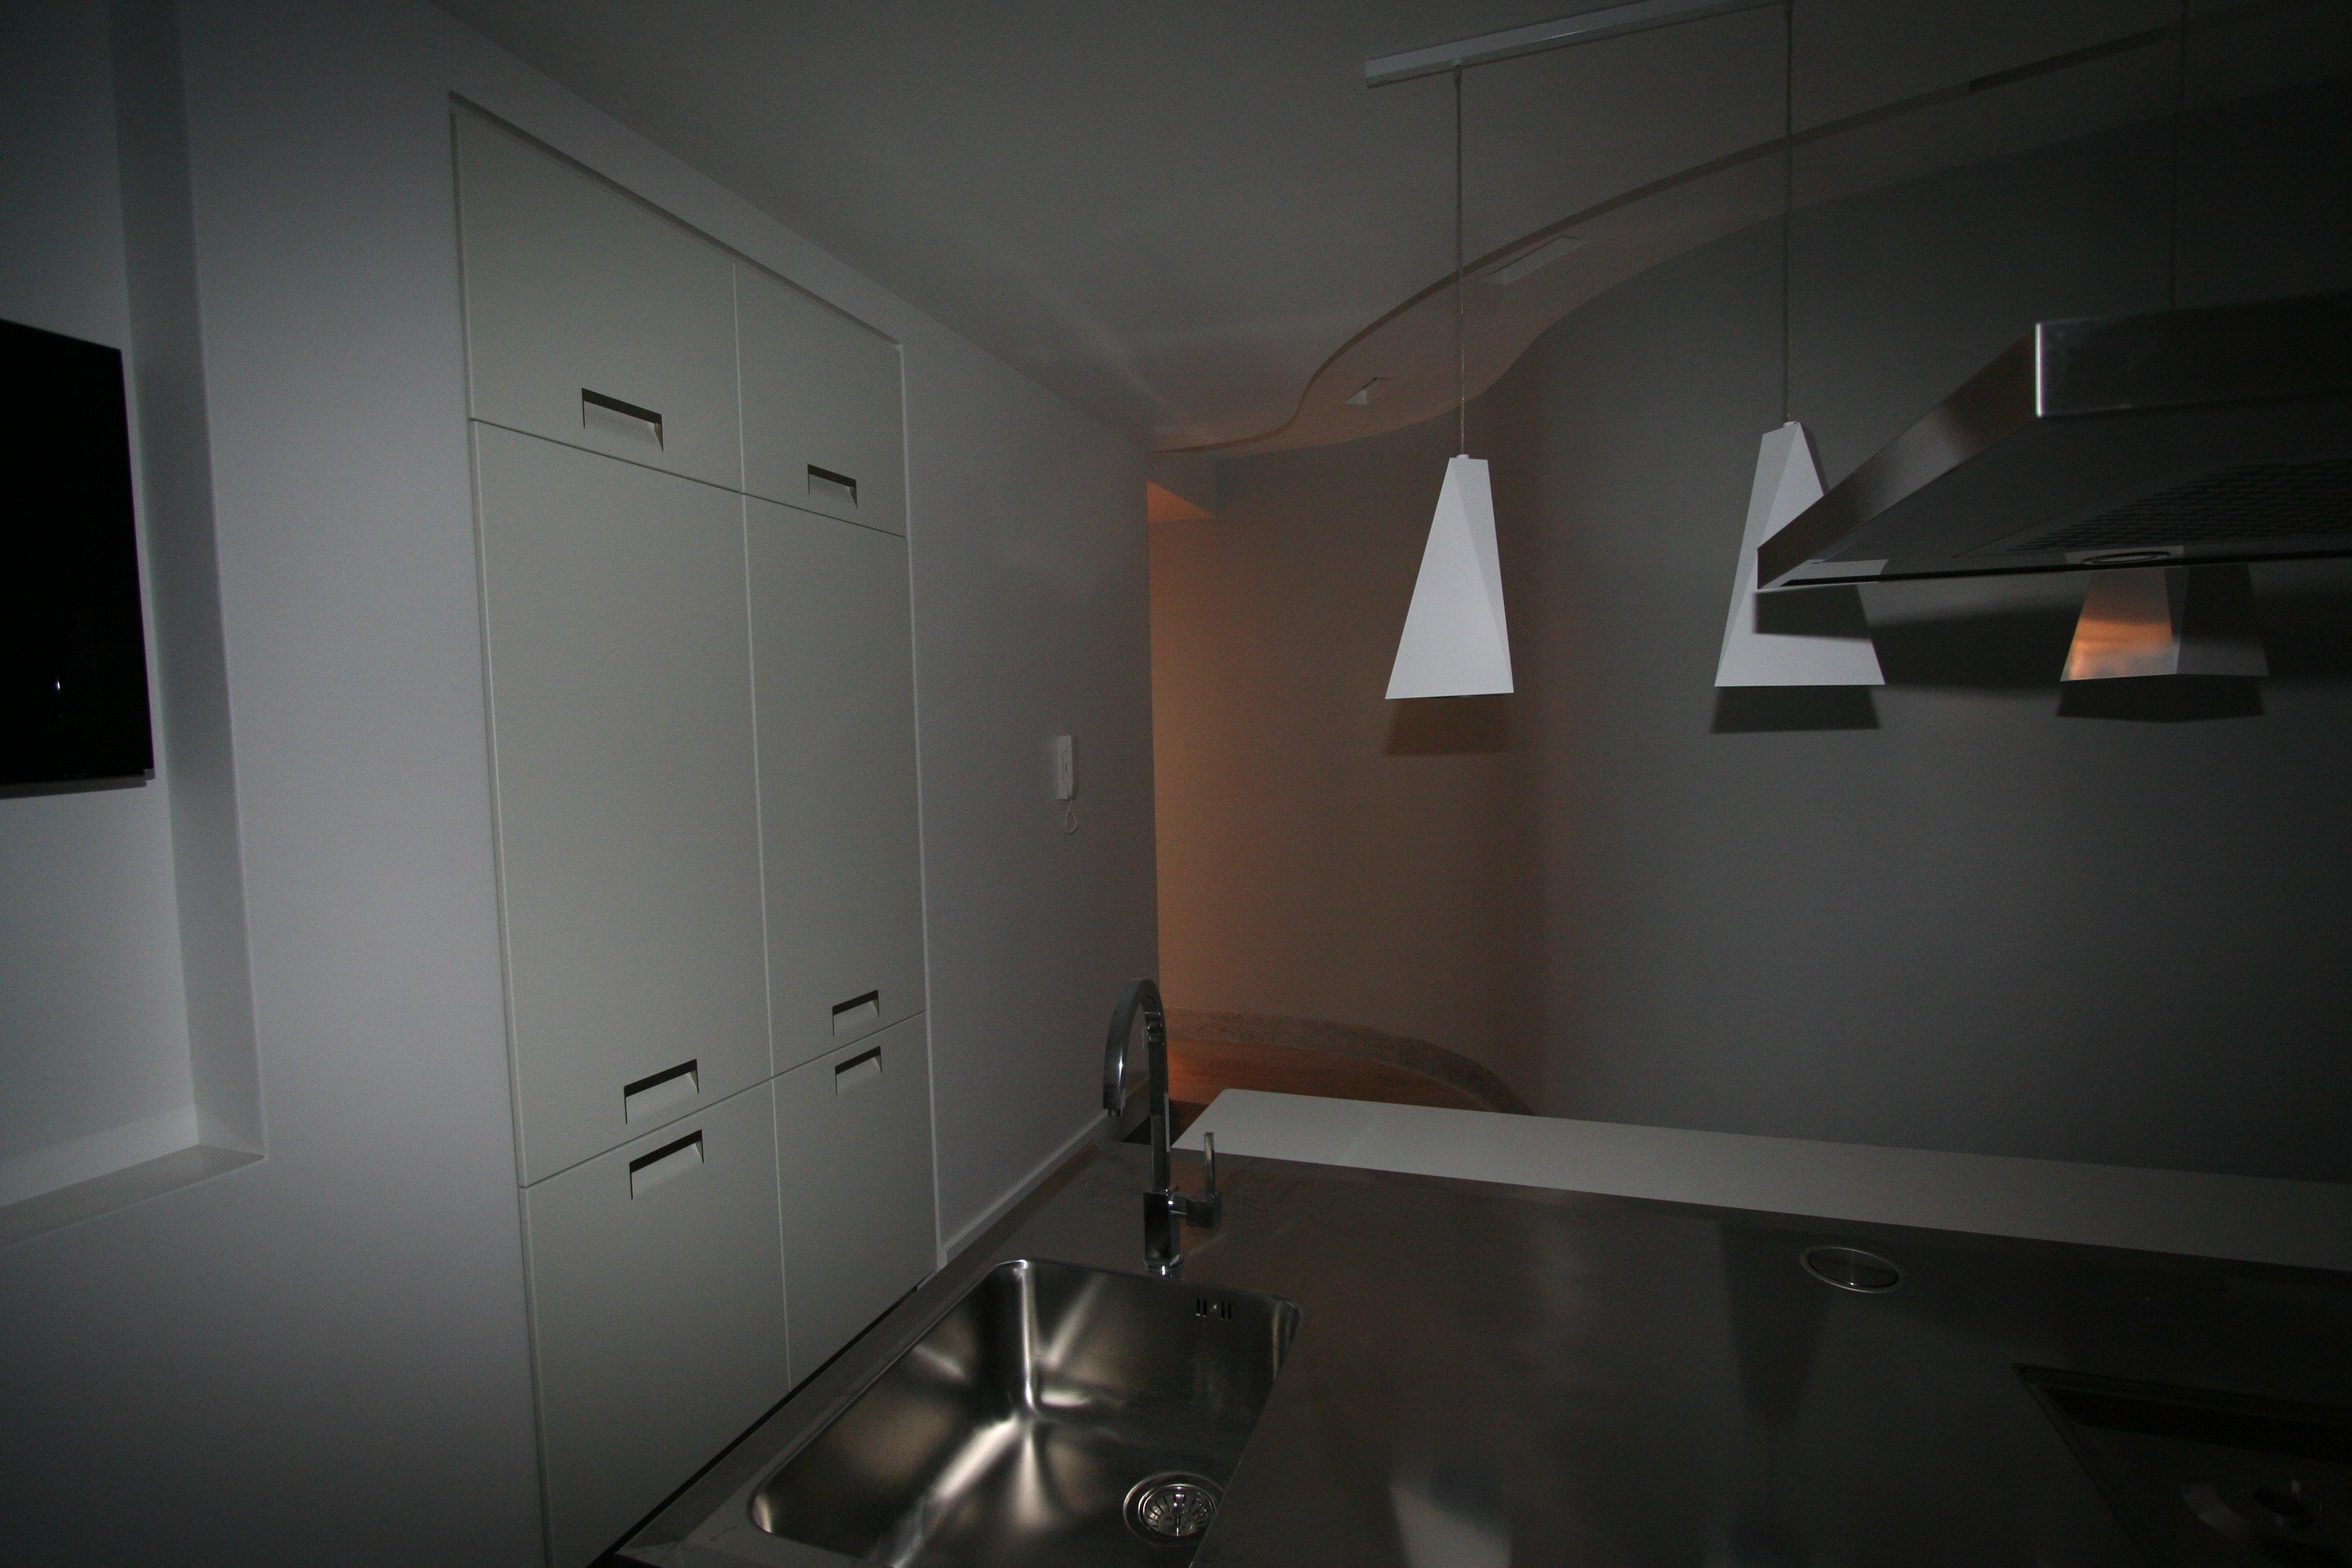 Image: Cucina foto 4 vista nicchia frigoriferi fata sul ...